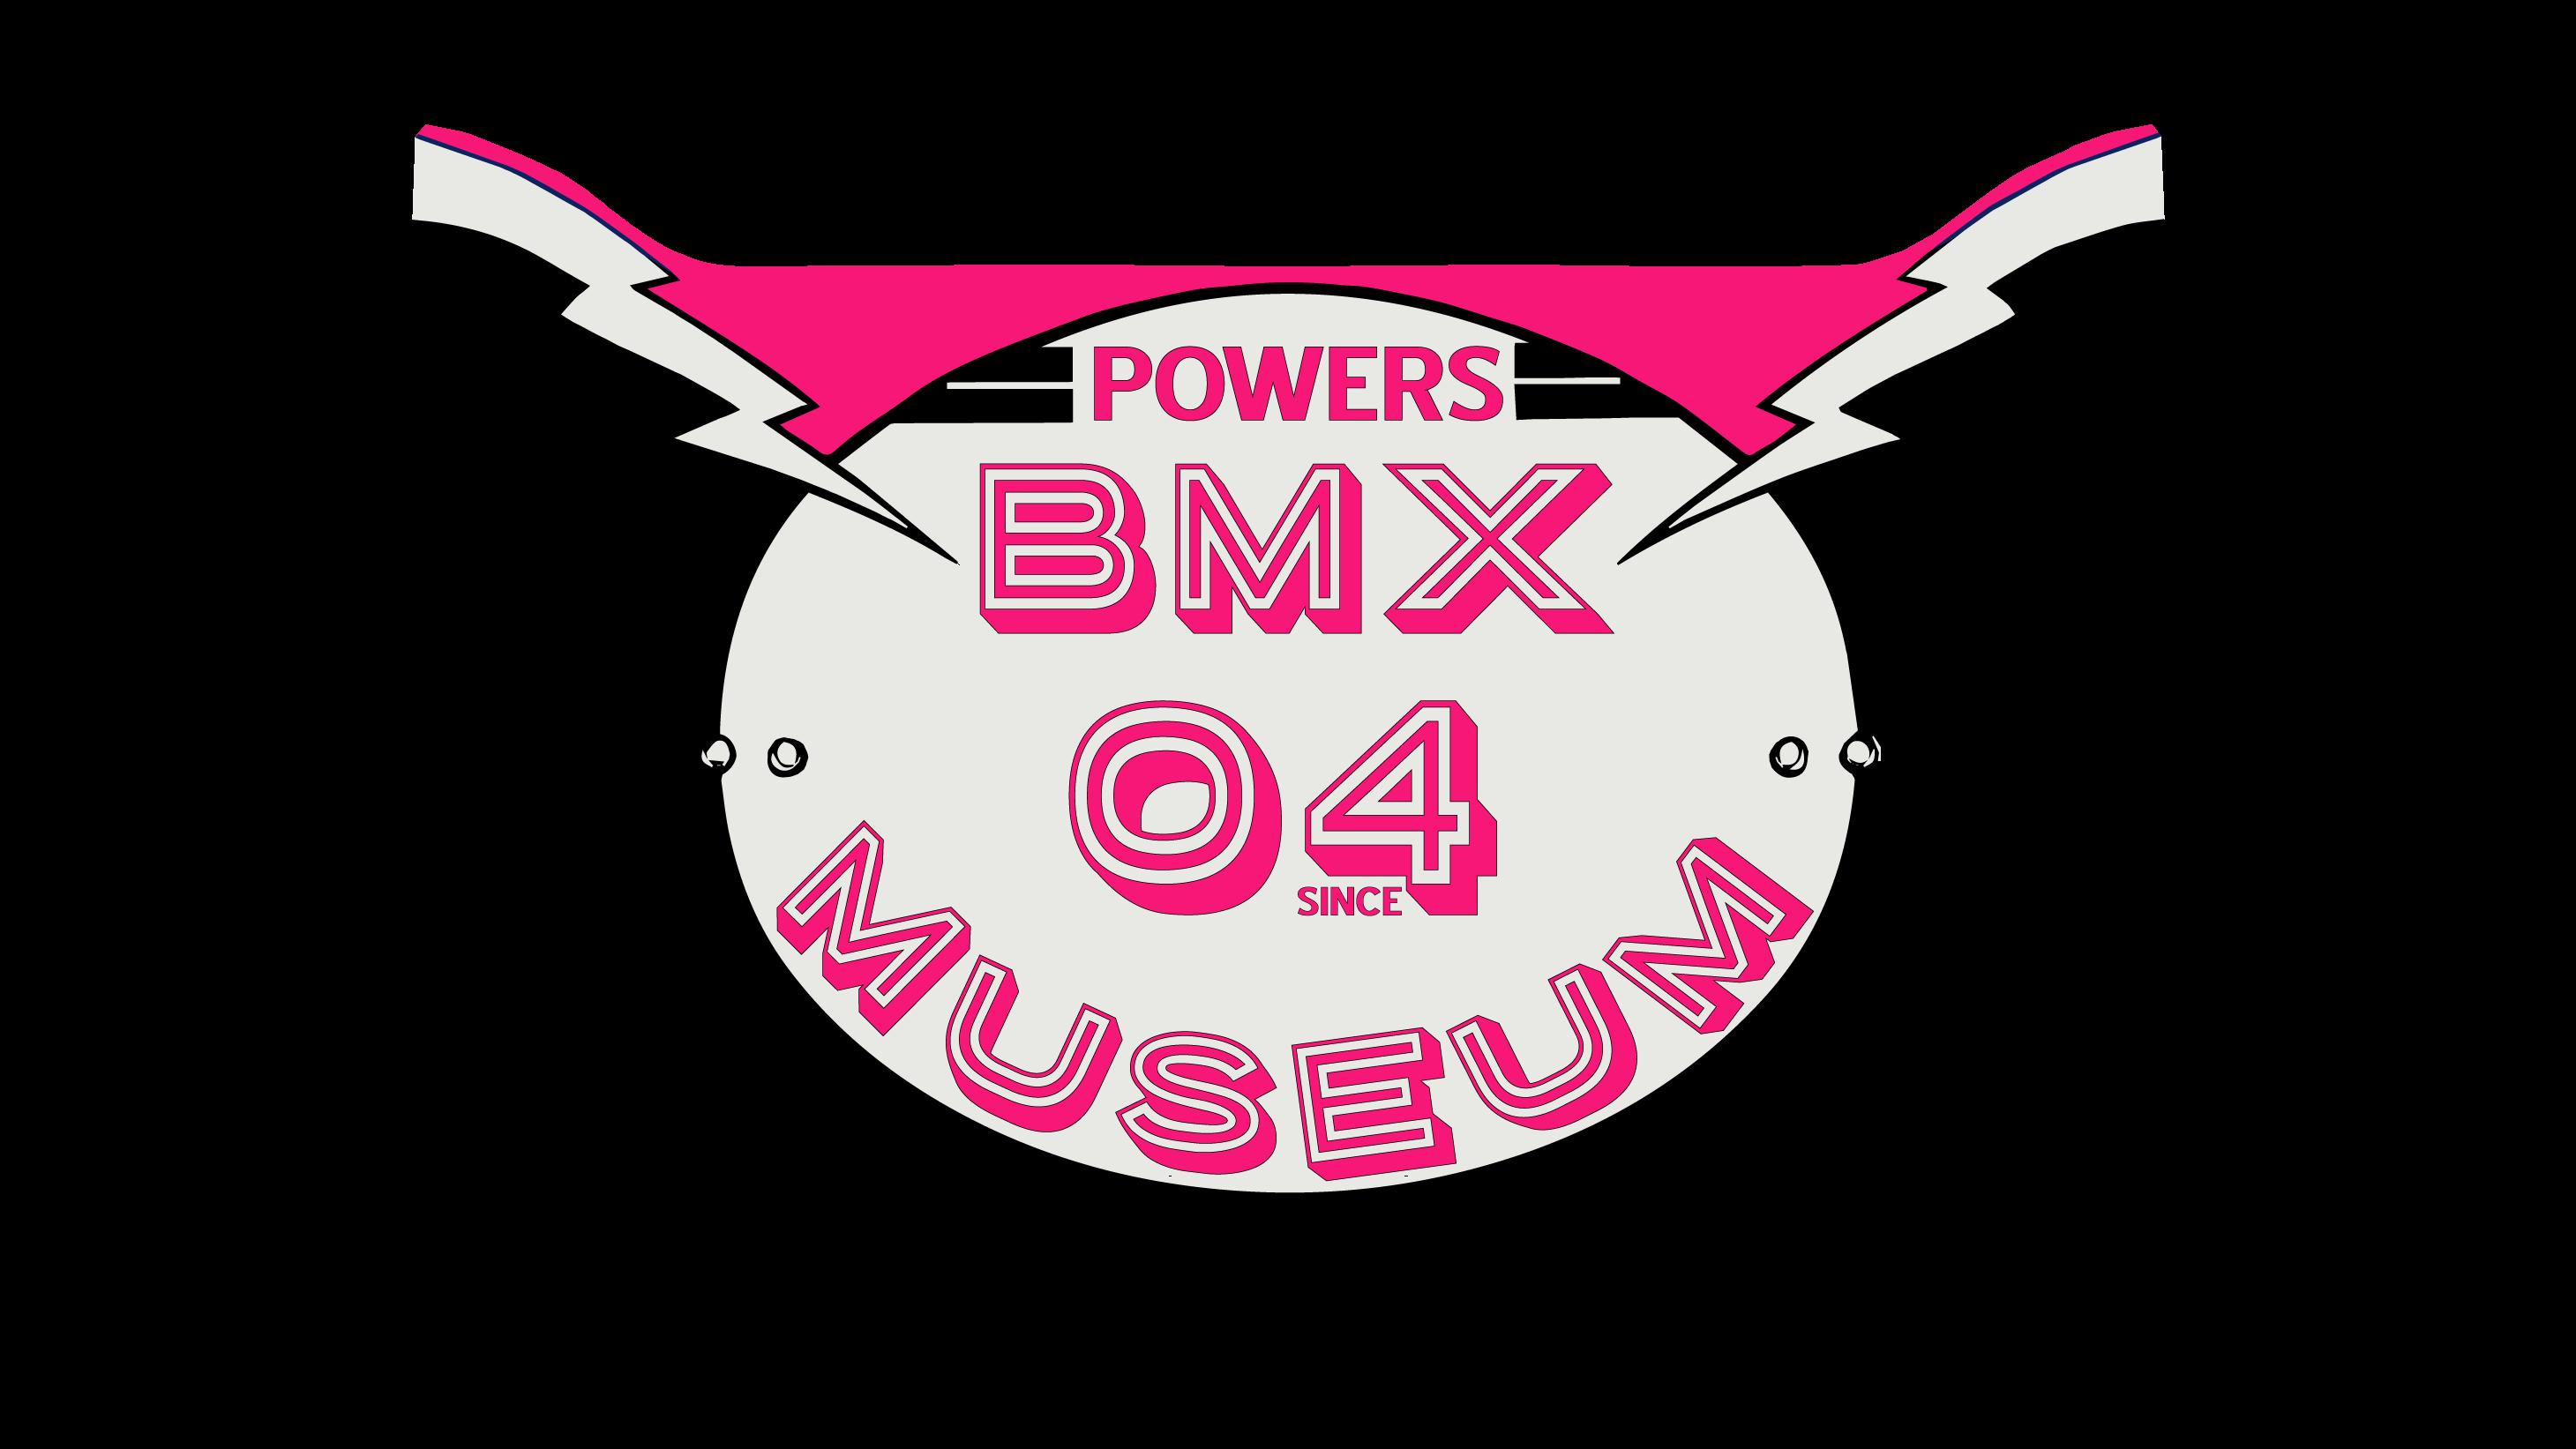 Powers BMX Museum